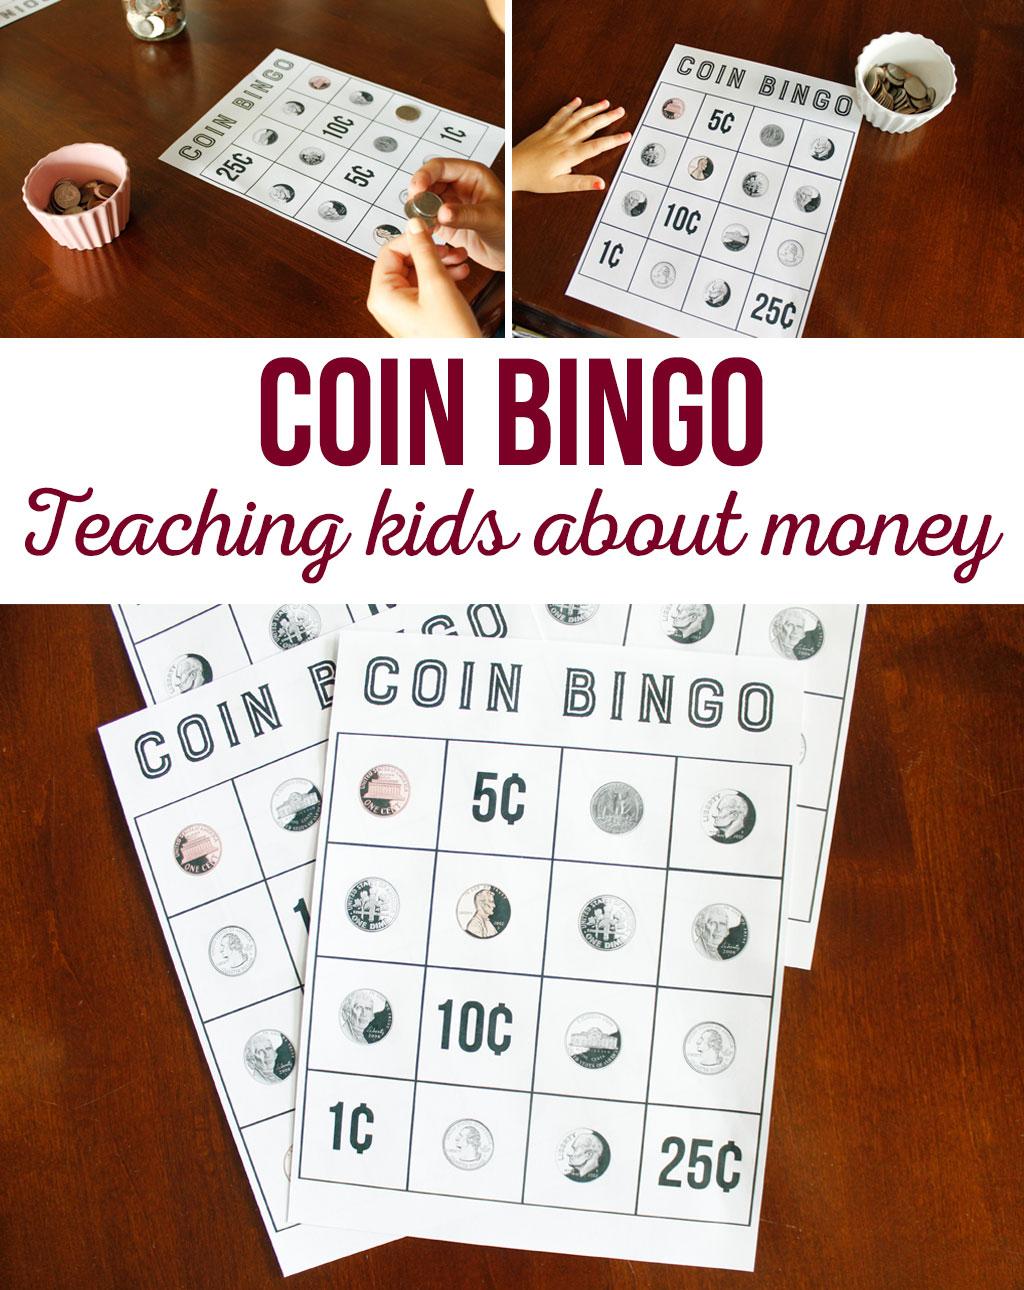 Coin Bingo Free Printable - The Crafting Chicks